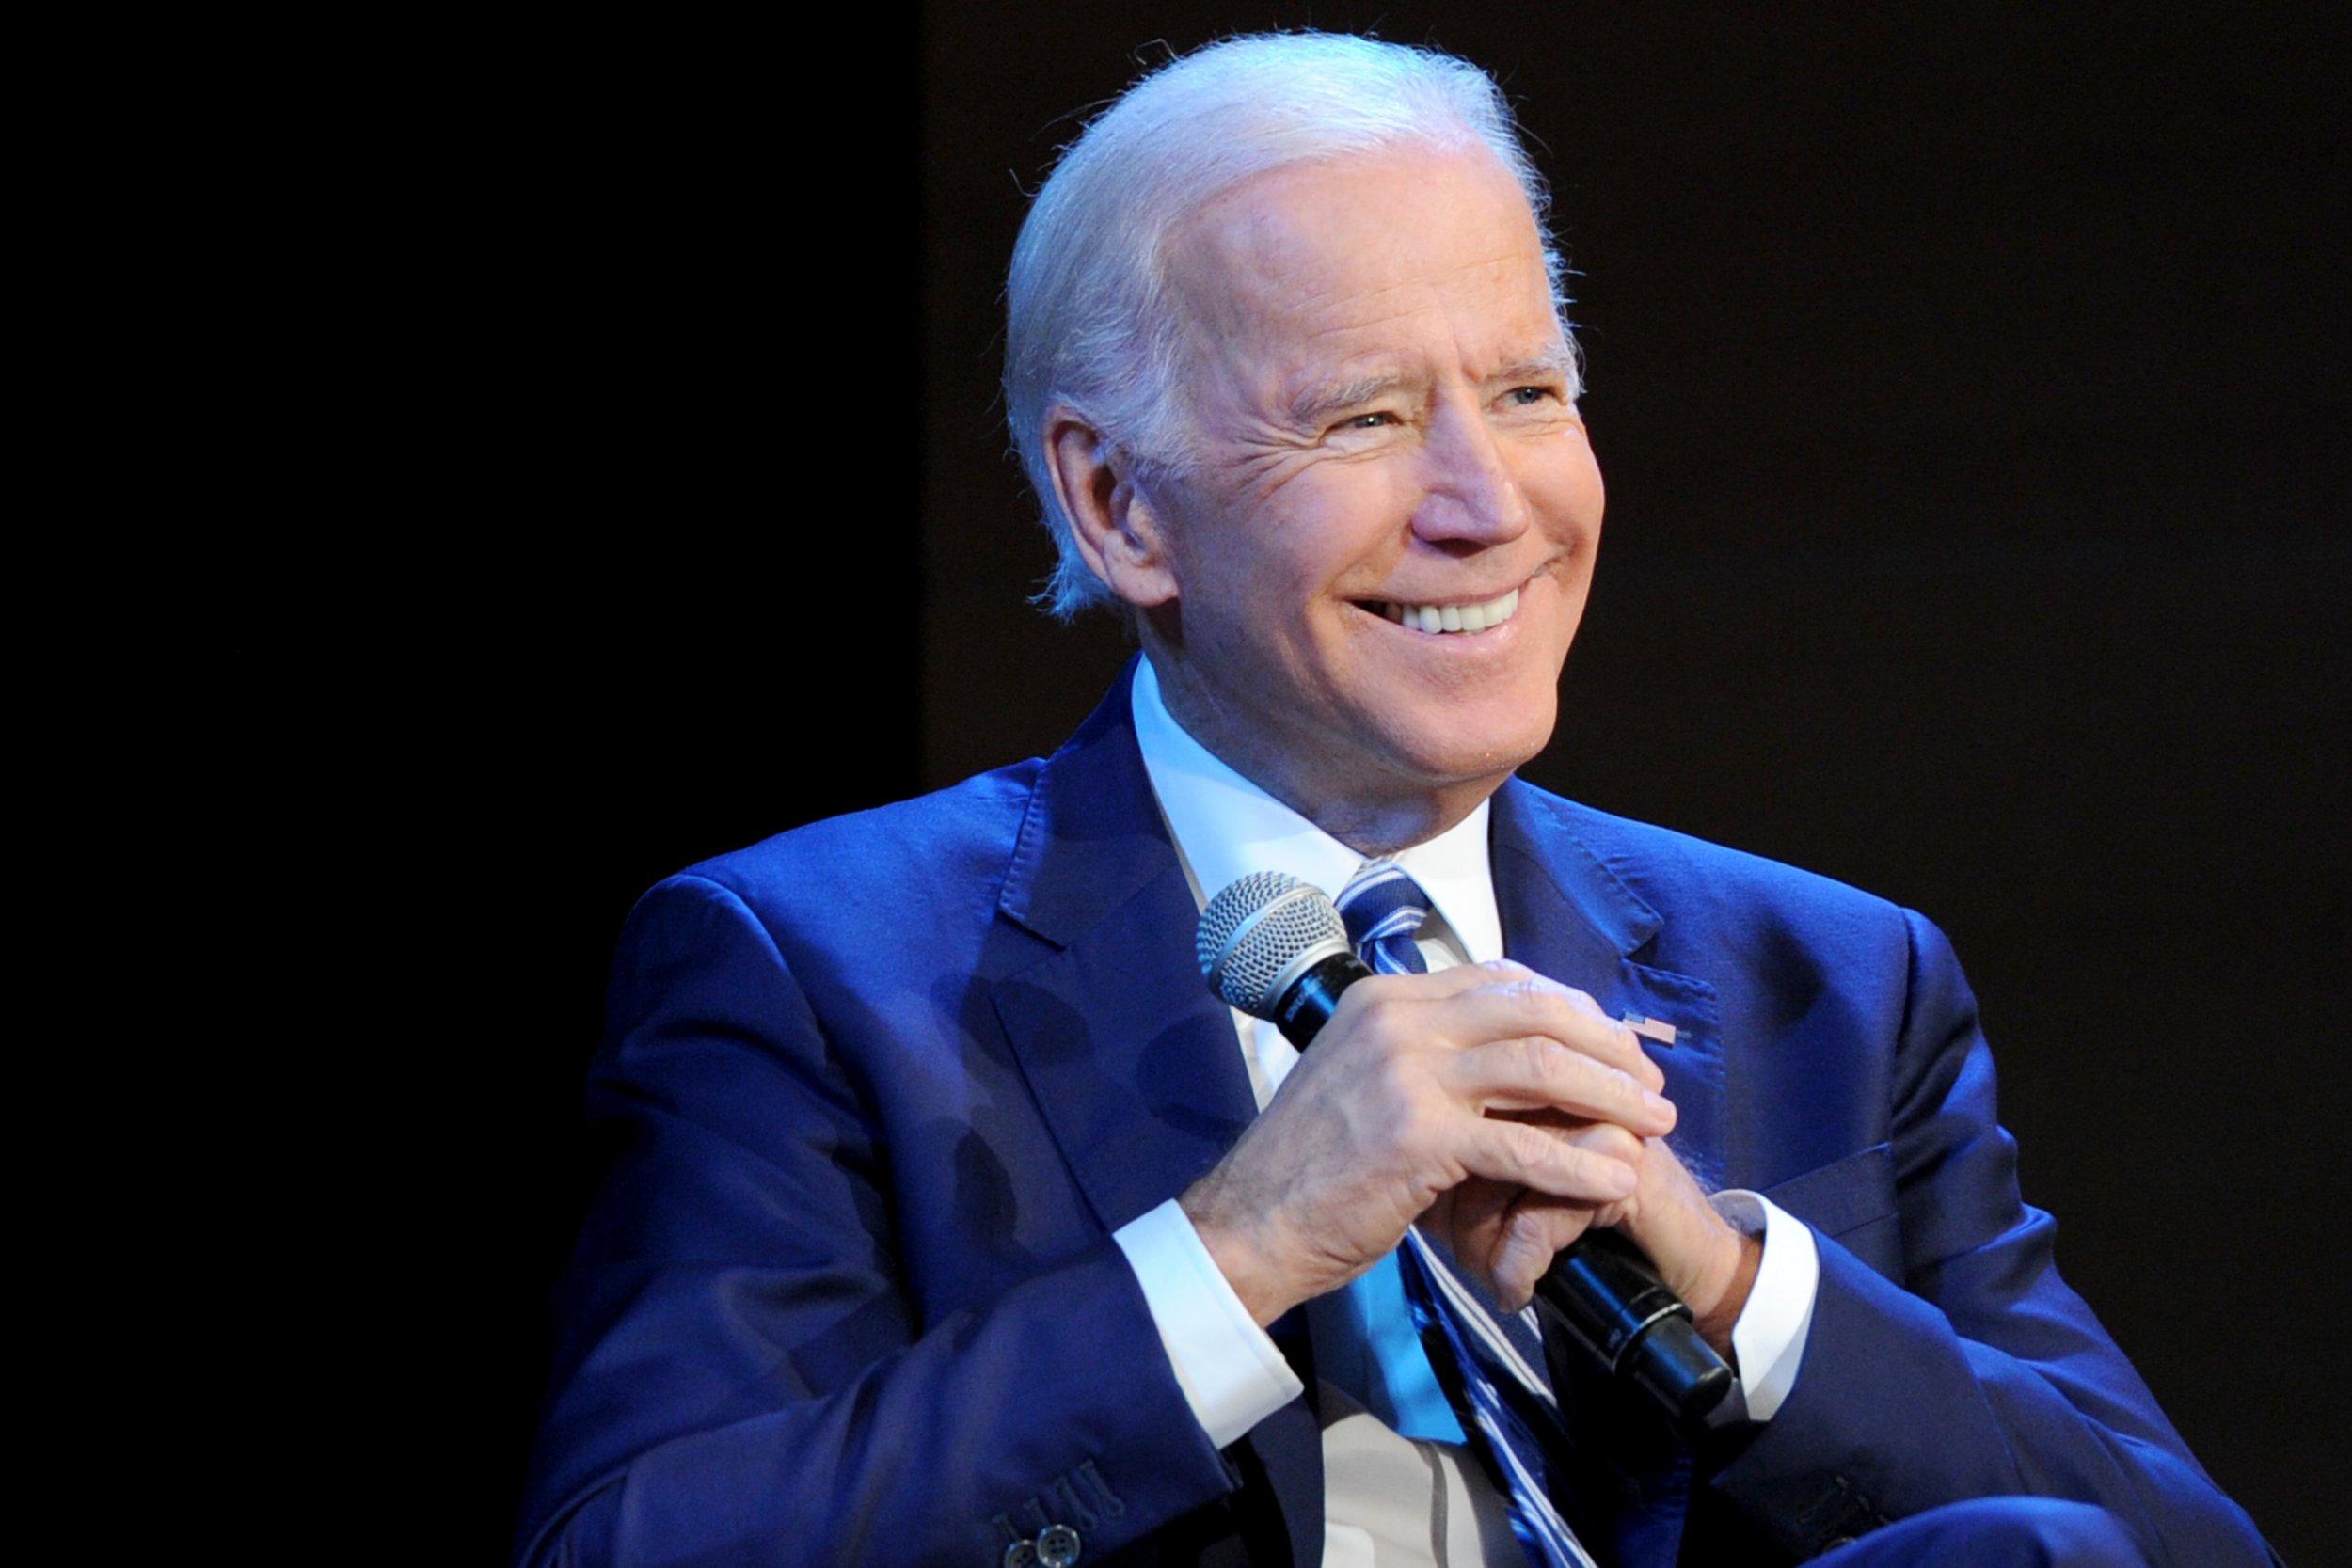 Joe Biden Slams Universal Basic Income A Job Is About A Lot More Than A Paycheck